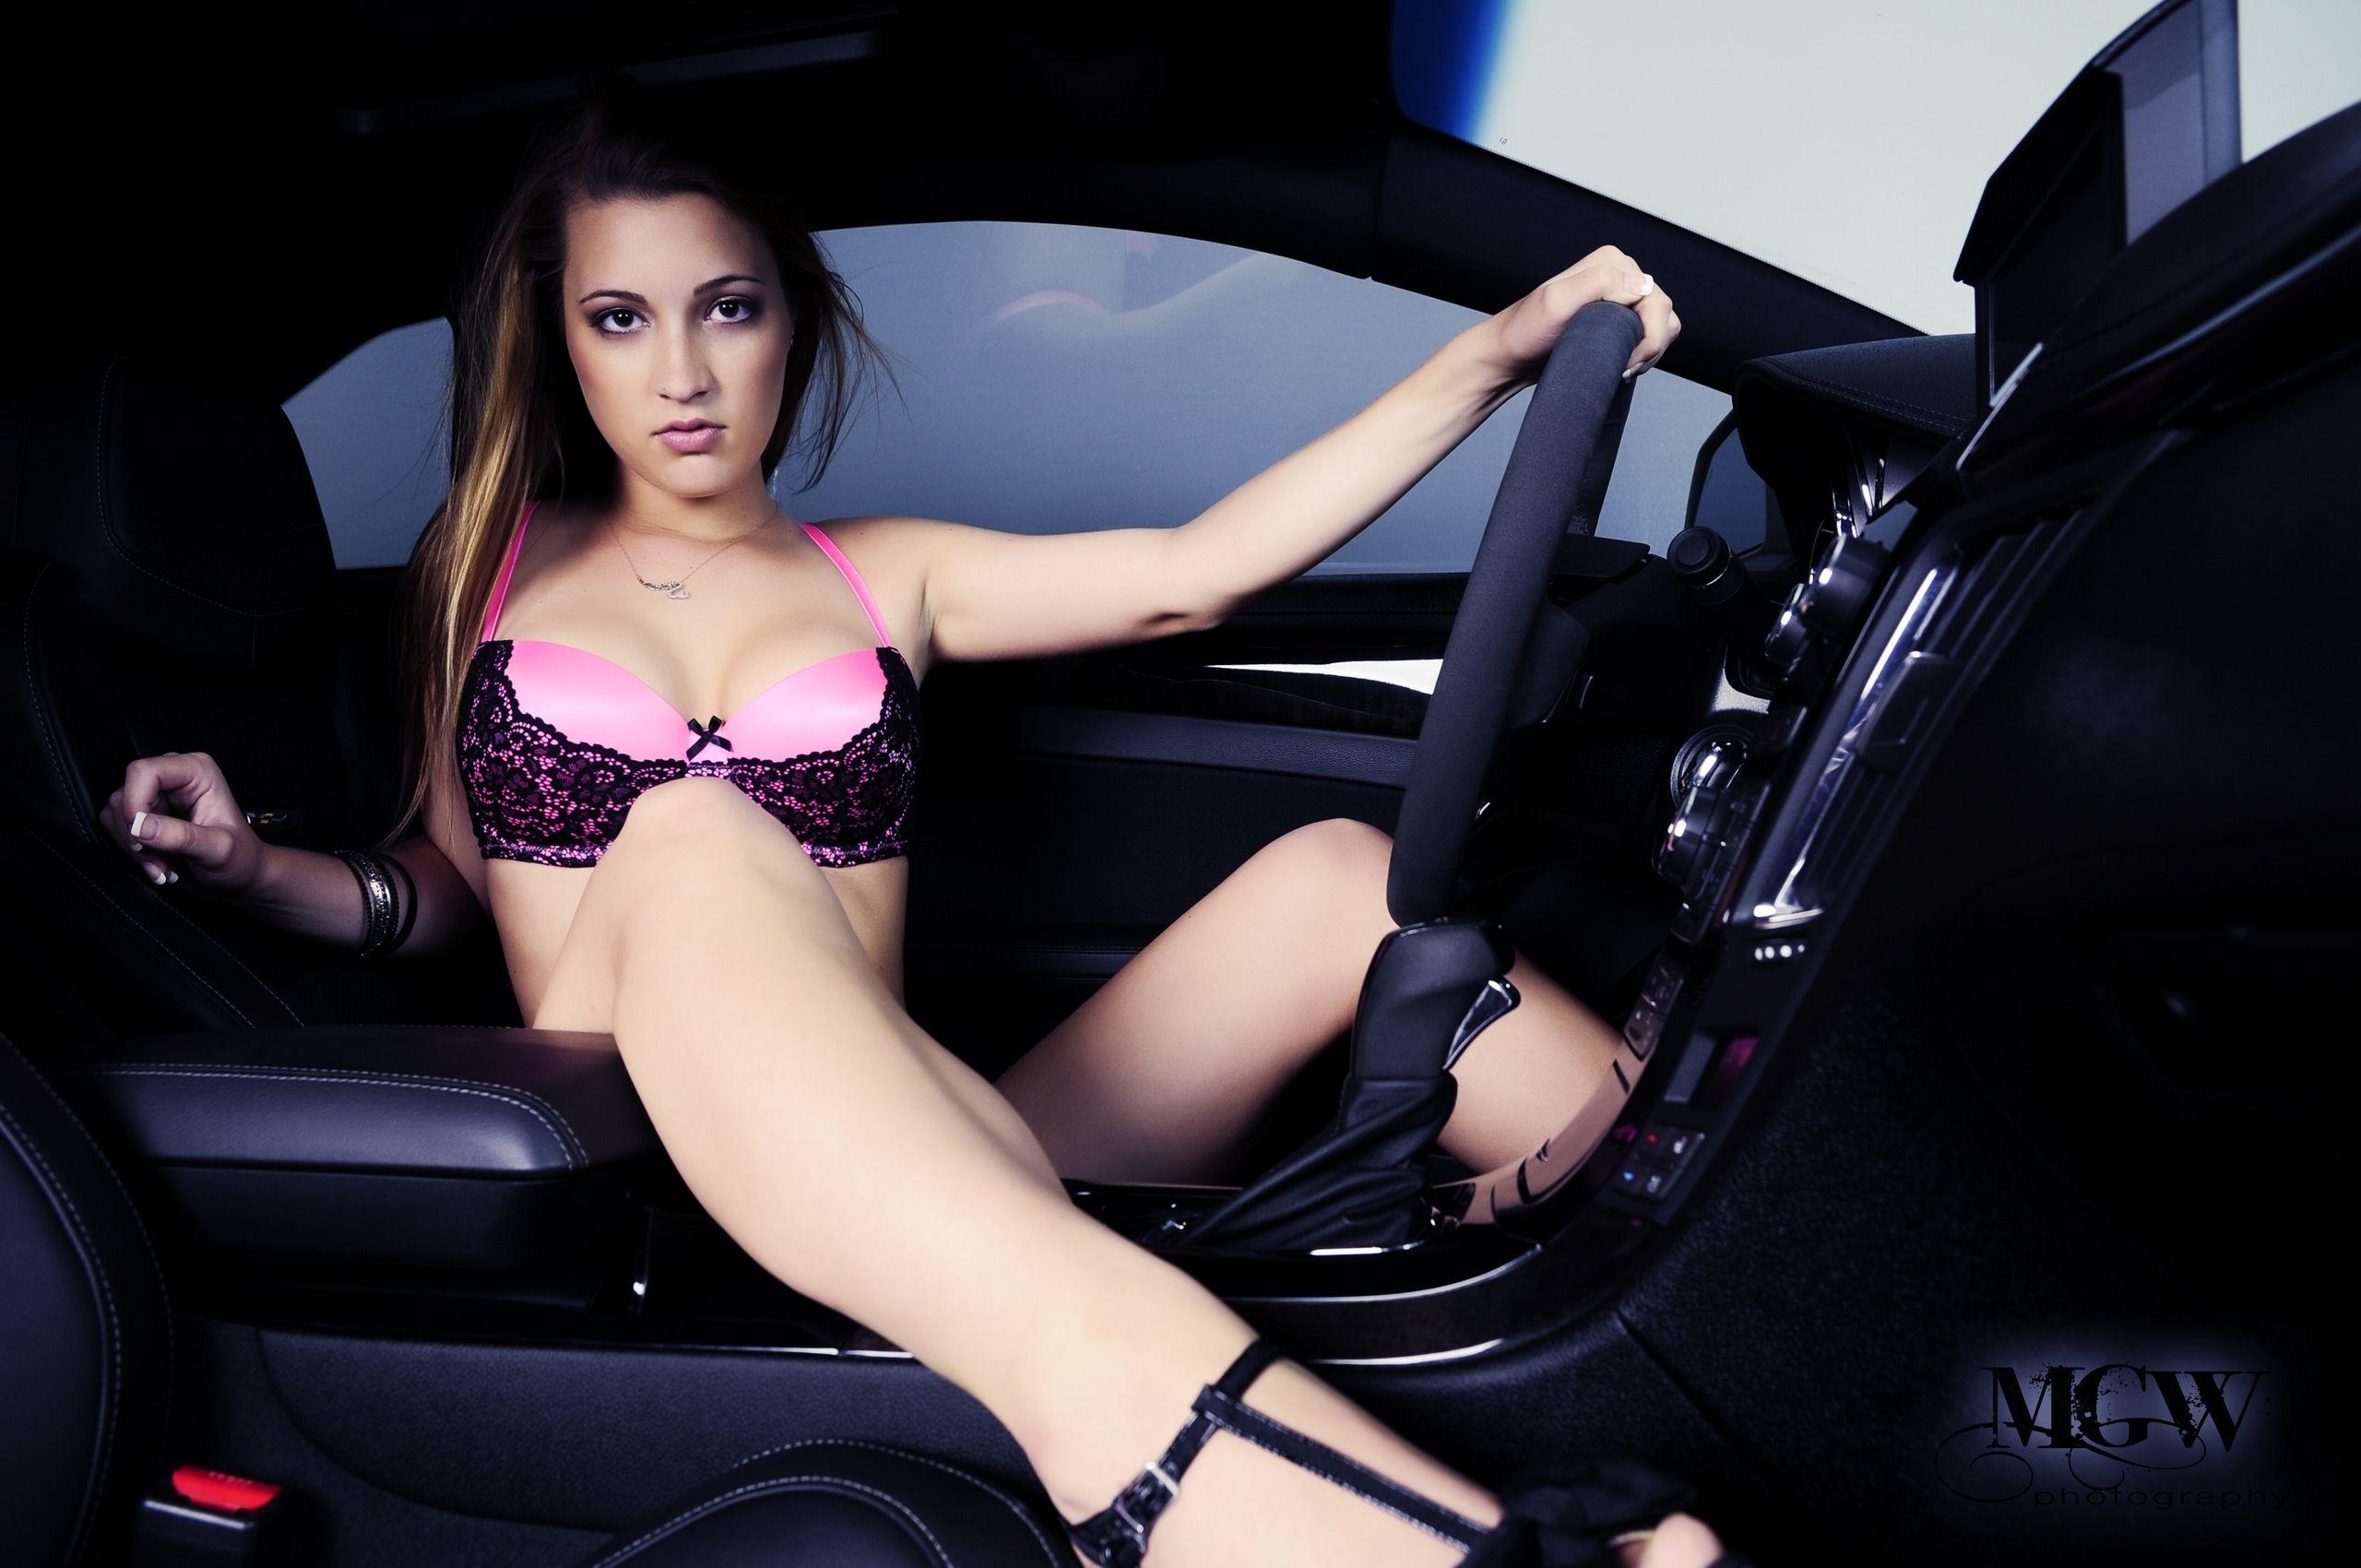 Belle fille porno